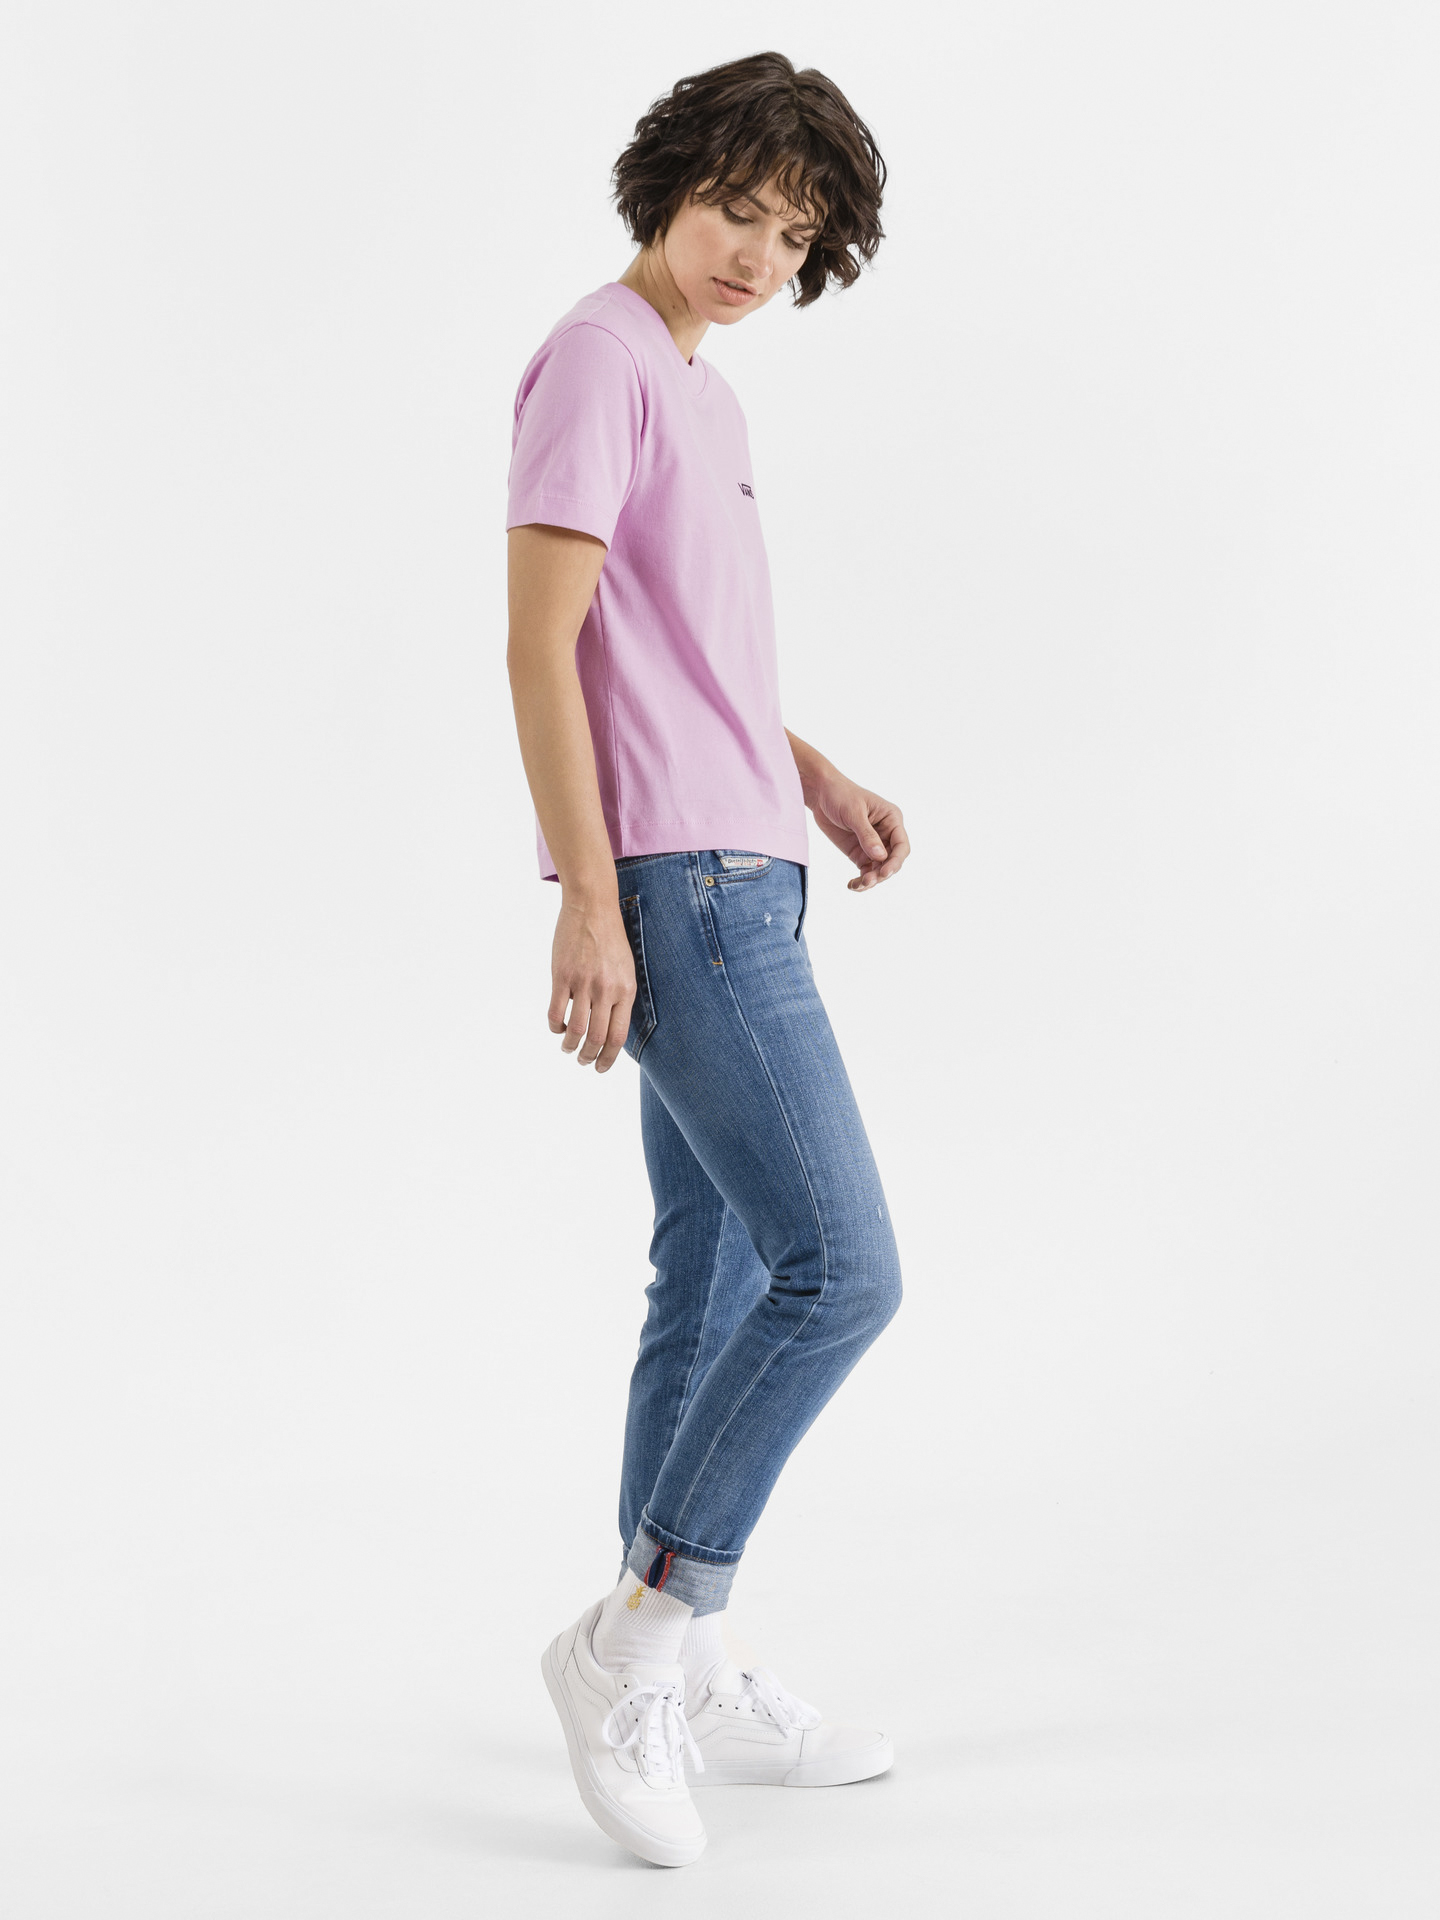 Vans różowy koszulka Junior V Boxy